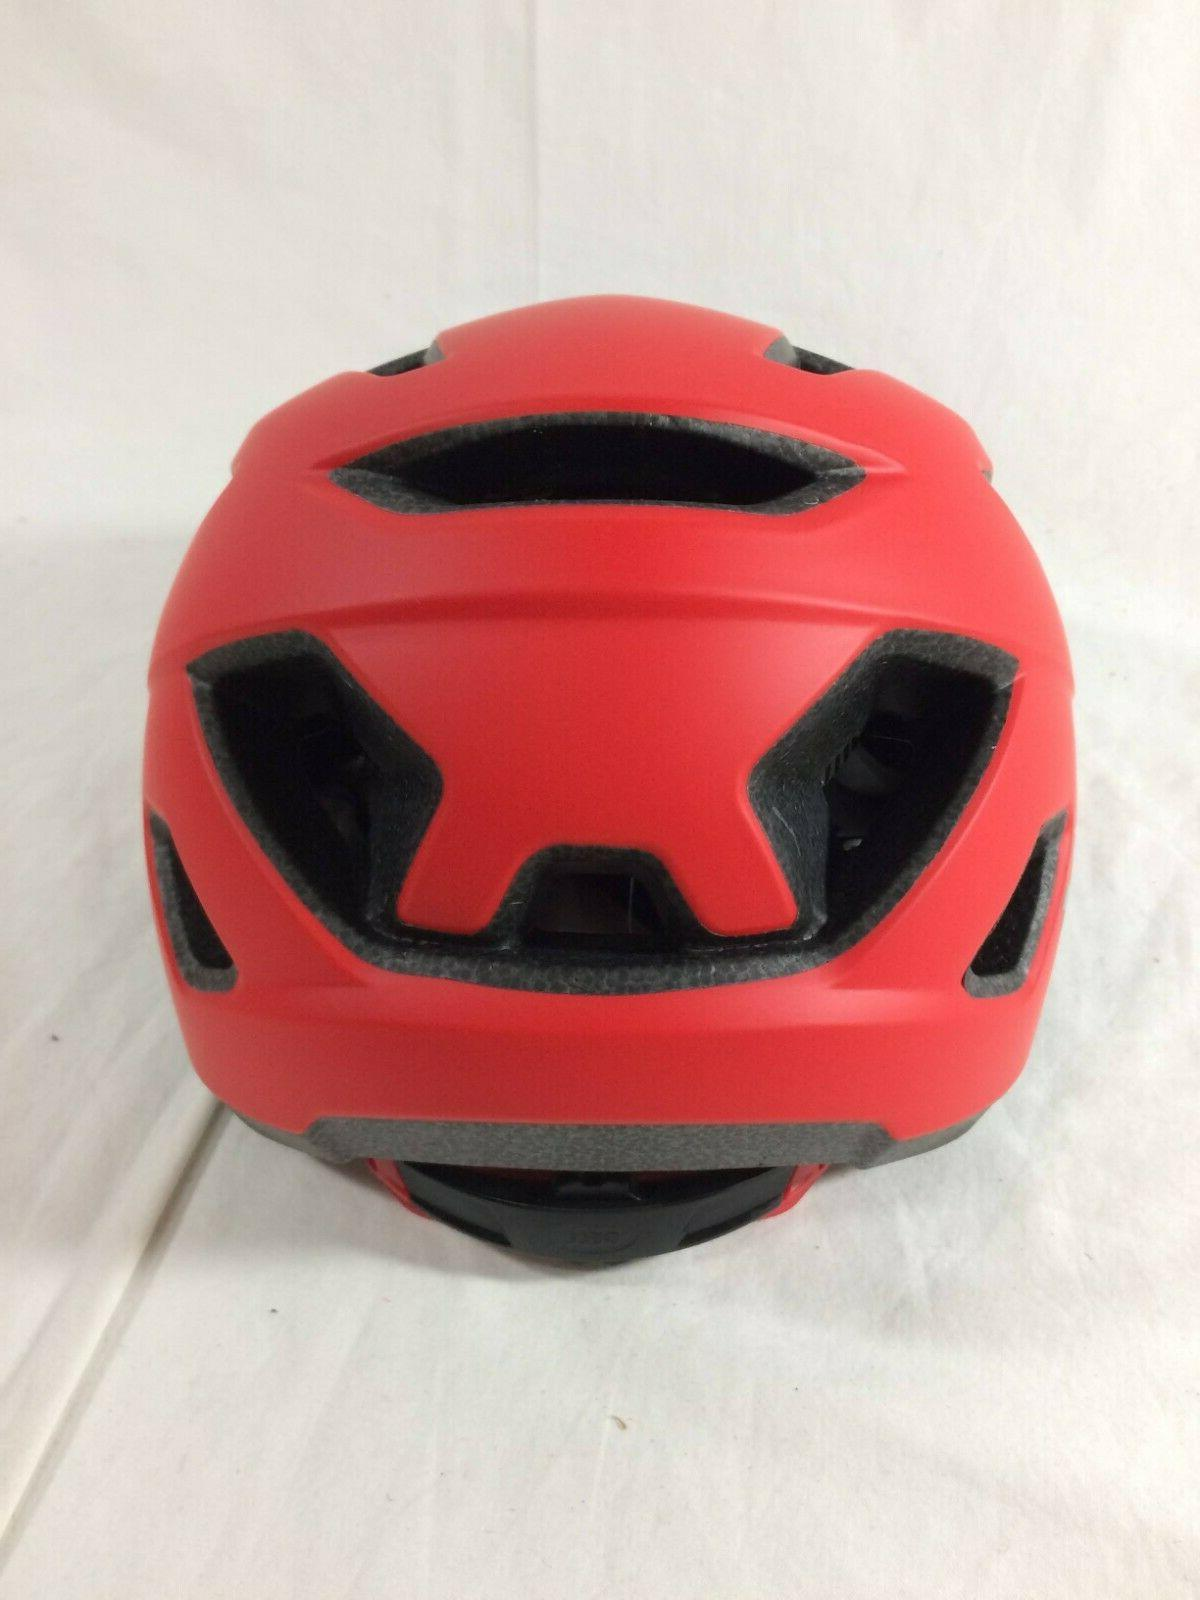 Bell Mountain Bike Helmet, Matte Red/Black, Universal